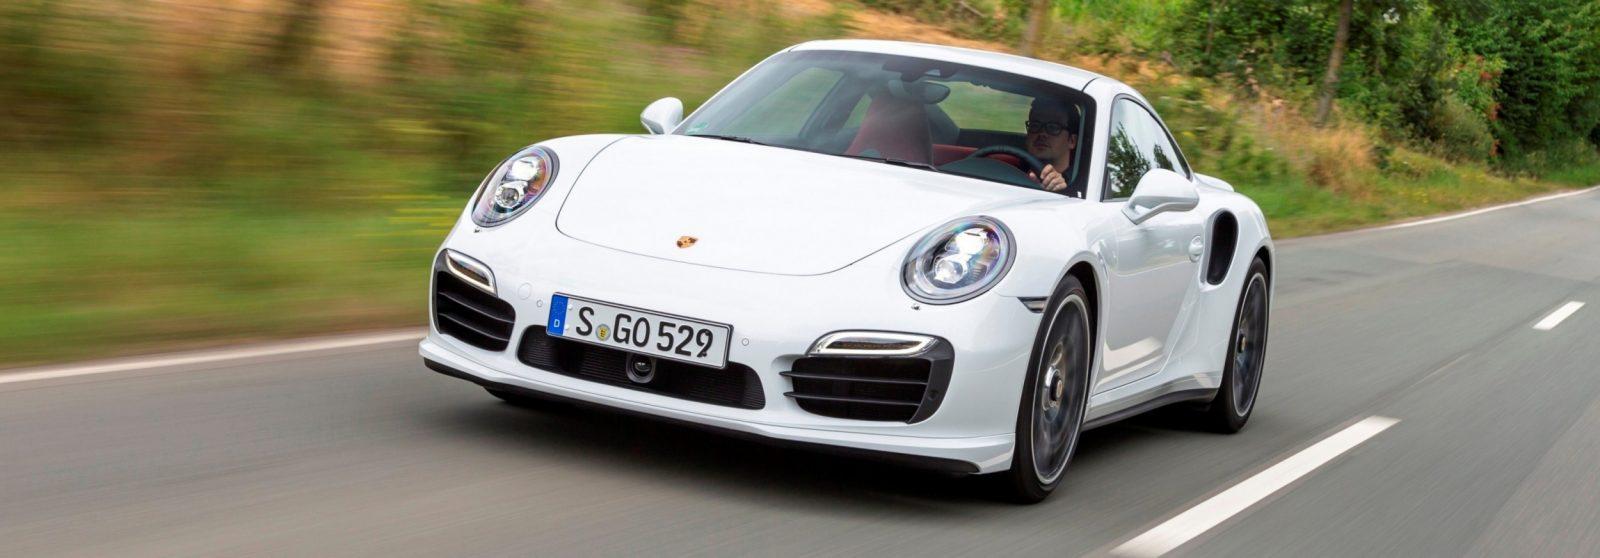 Porsche 911 Turbo S _11_